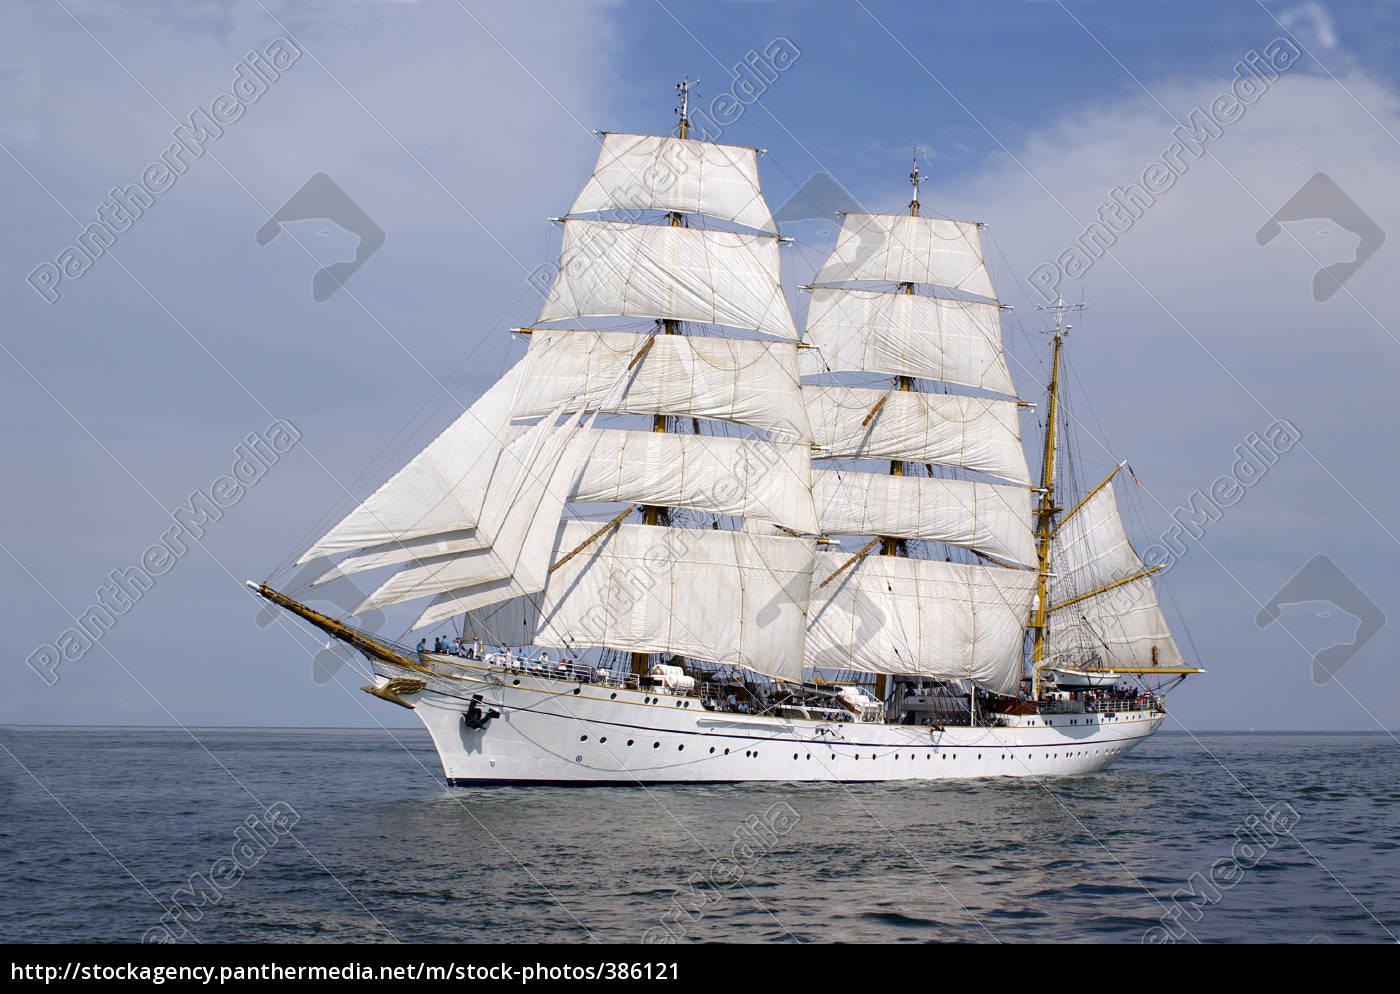 sailing, school, ship, gorch, fock - 386121